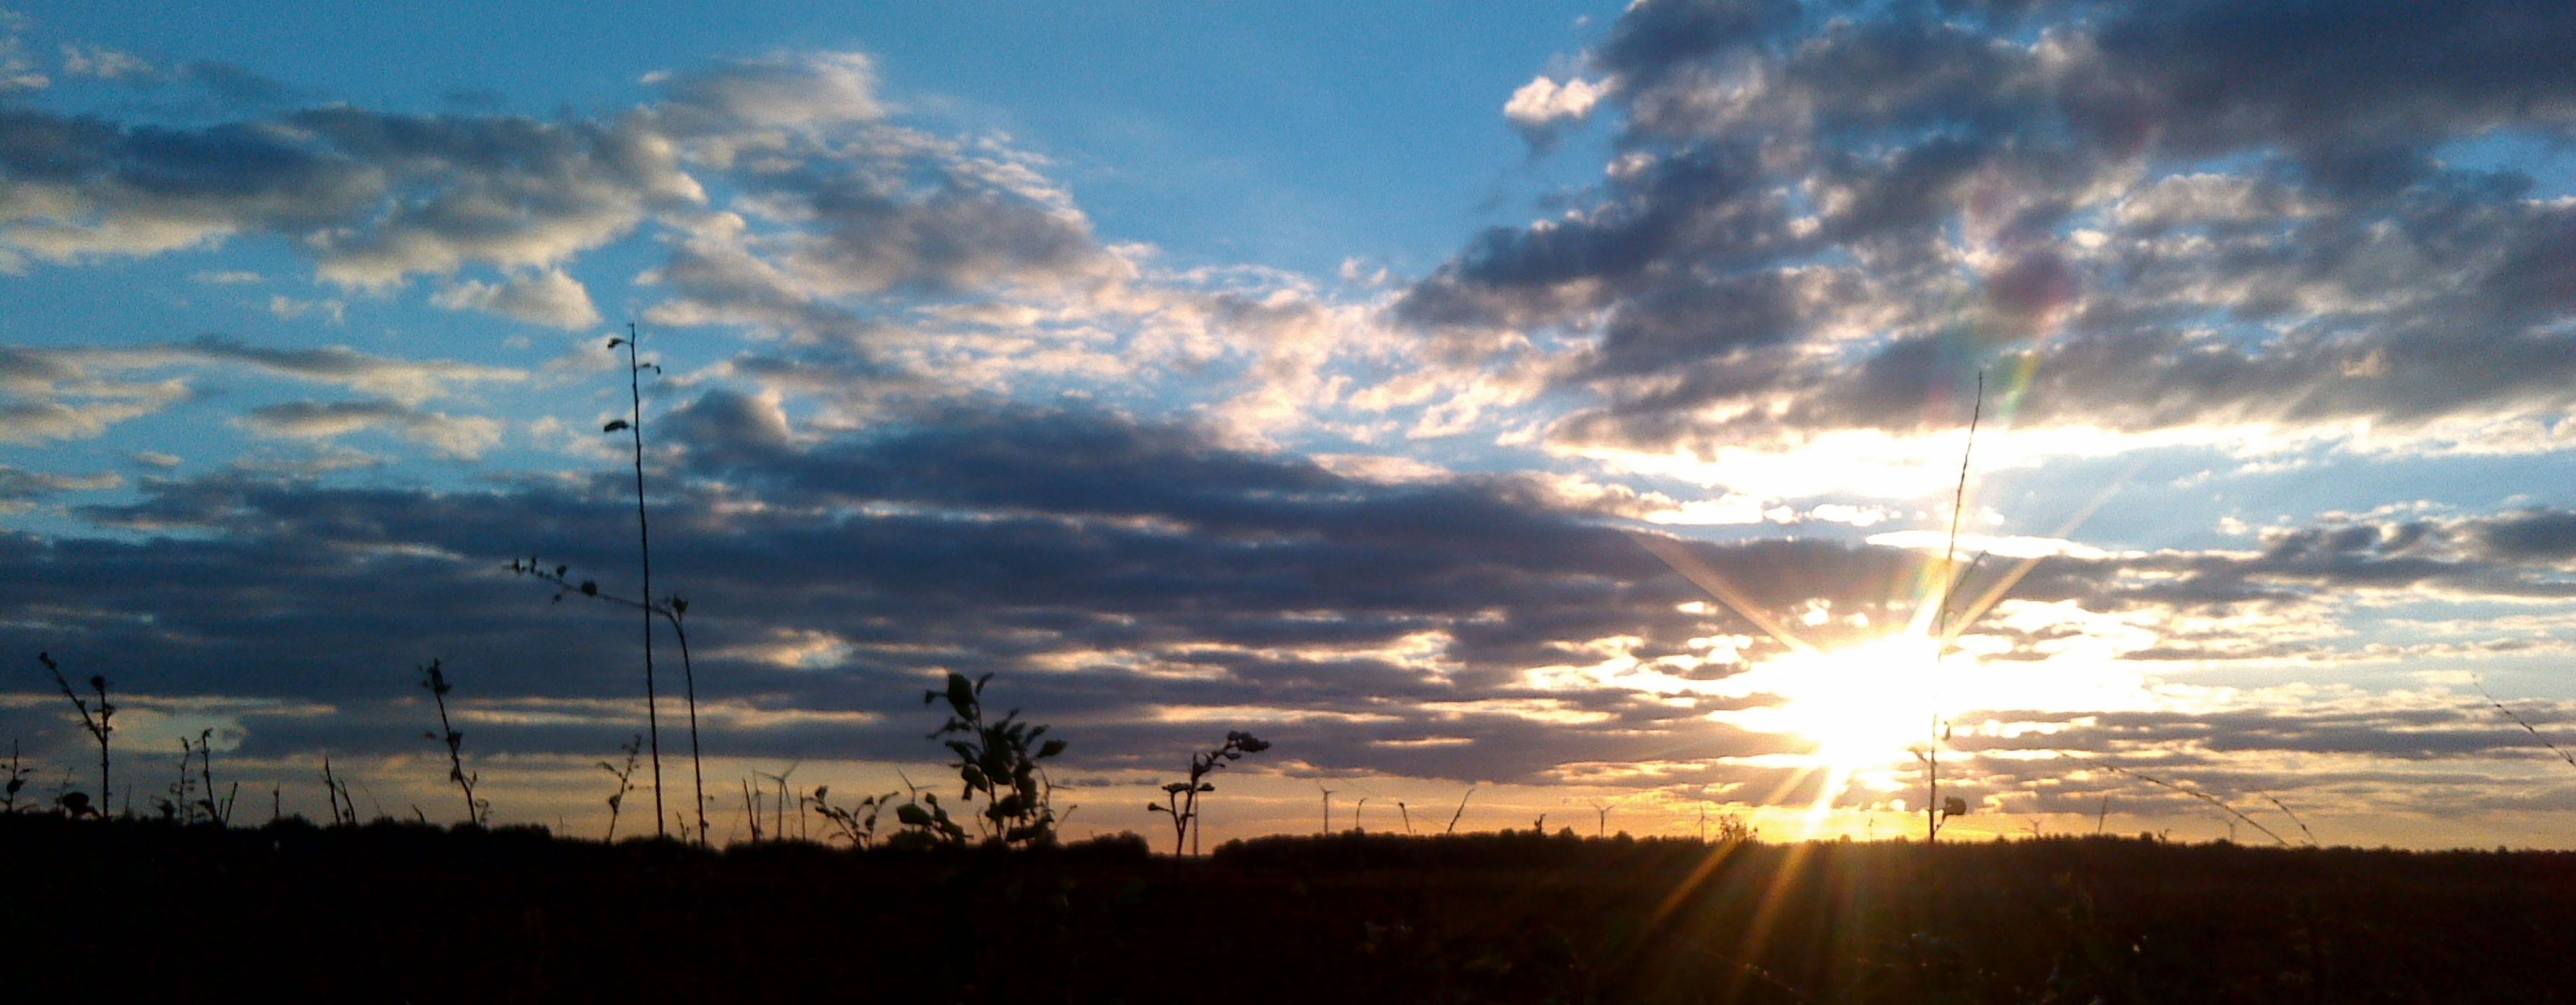 Moorniederung bei Sonnenuntergang